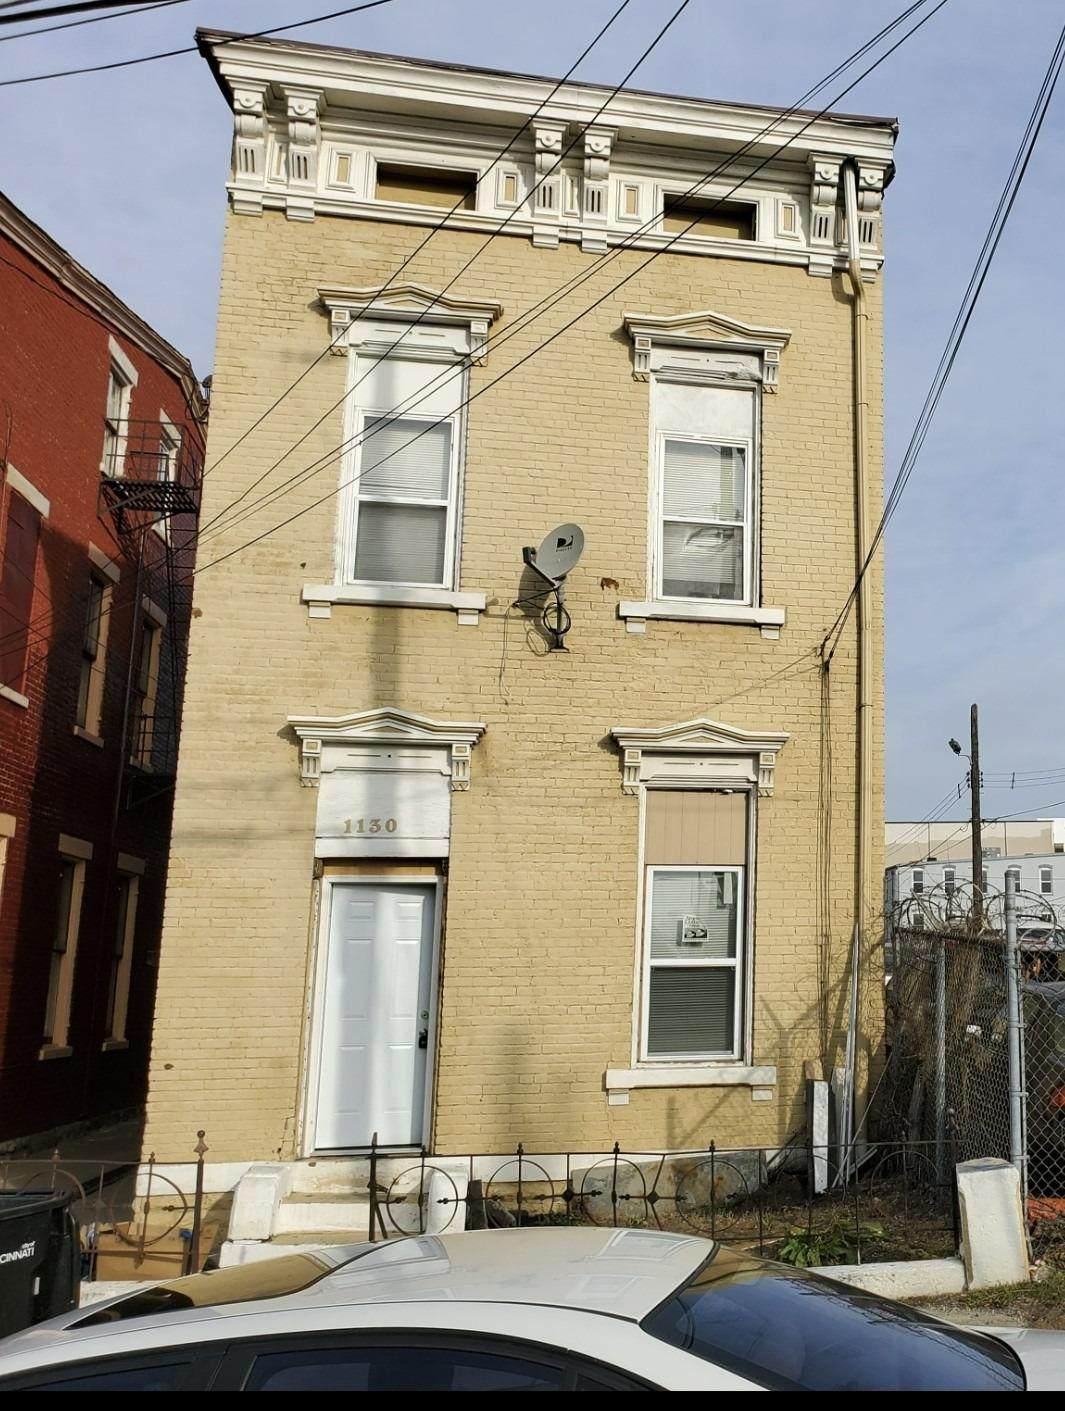 1130 Draper Street - Photo 1